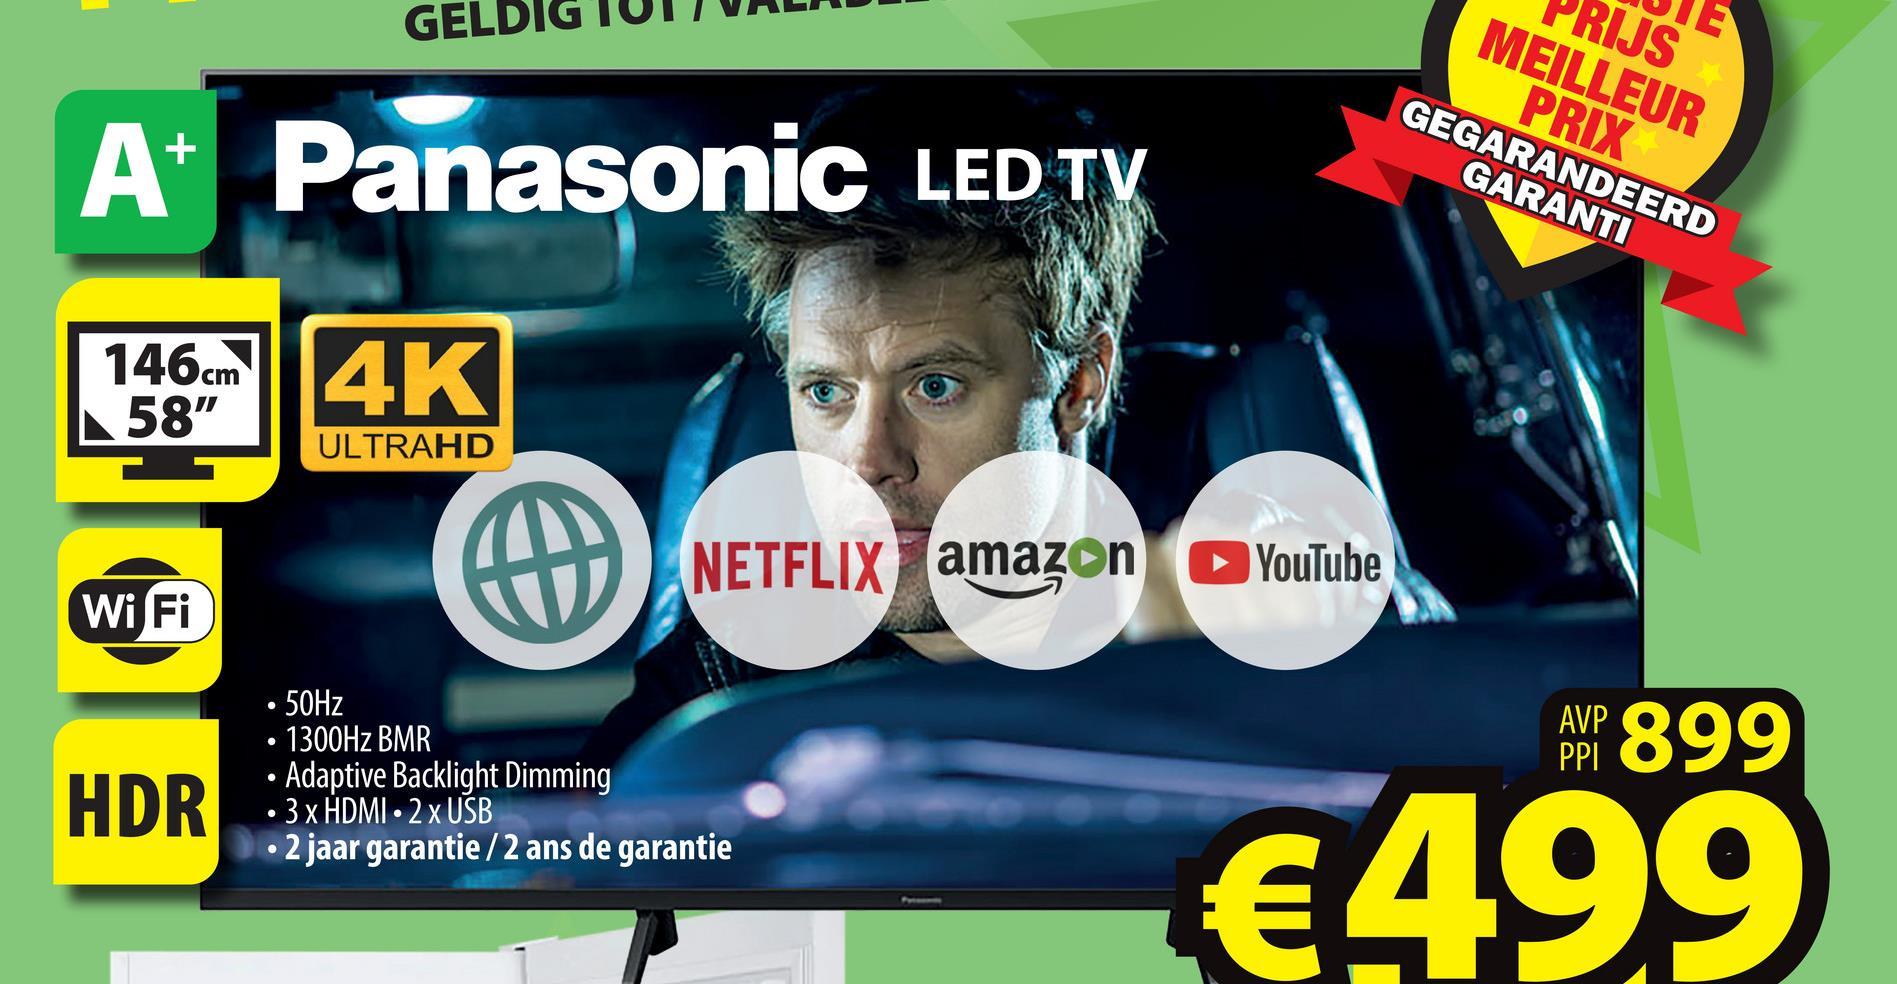 "GELDIG 2 RIJS MEILLEUR PRIX GEGARANDEERD GARANTI At Panasonic LED TV 146cm 58"" 4K ULTRAHD NETFLIX amazon YouTube Wi Fi AWP 899 HDR 50Hz 1300Hz BMR • Adaptive Backlight Dimming • 3 x HDMI - 2 x USB • 2 jaar garantie /2 ans de garantie €499"